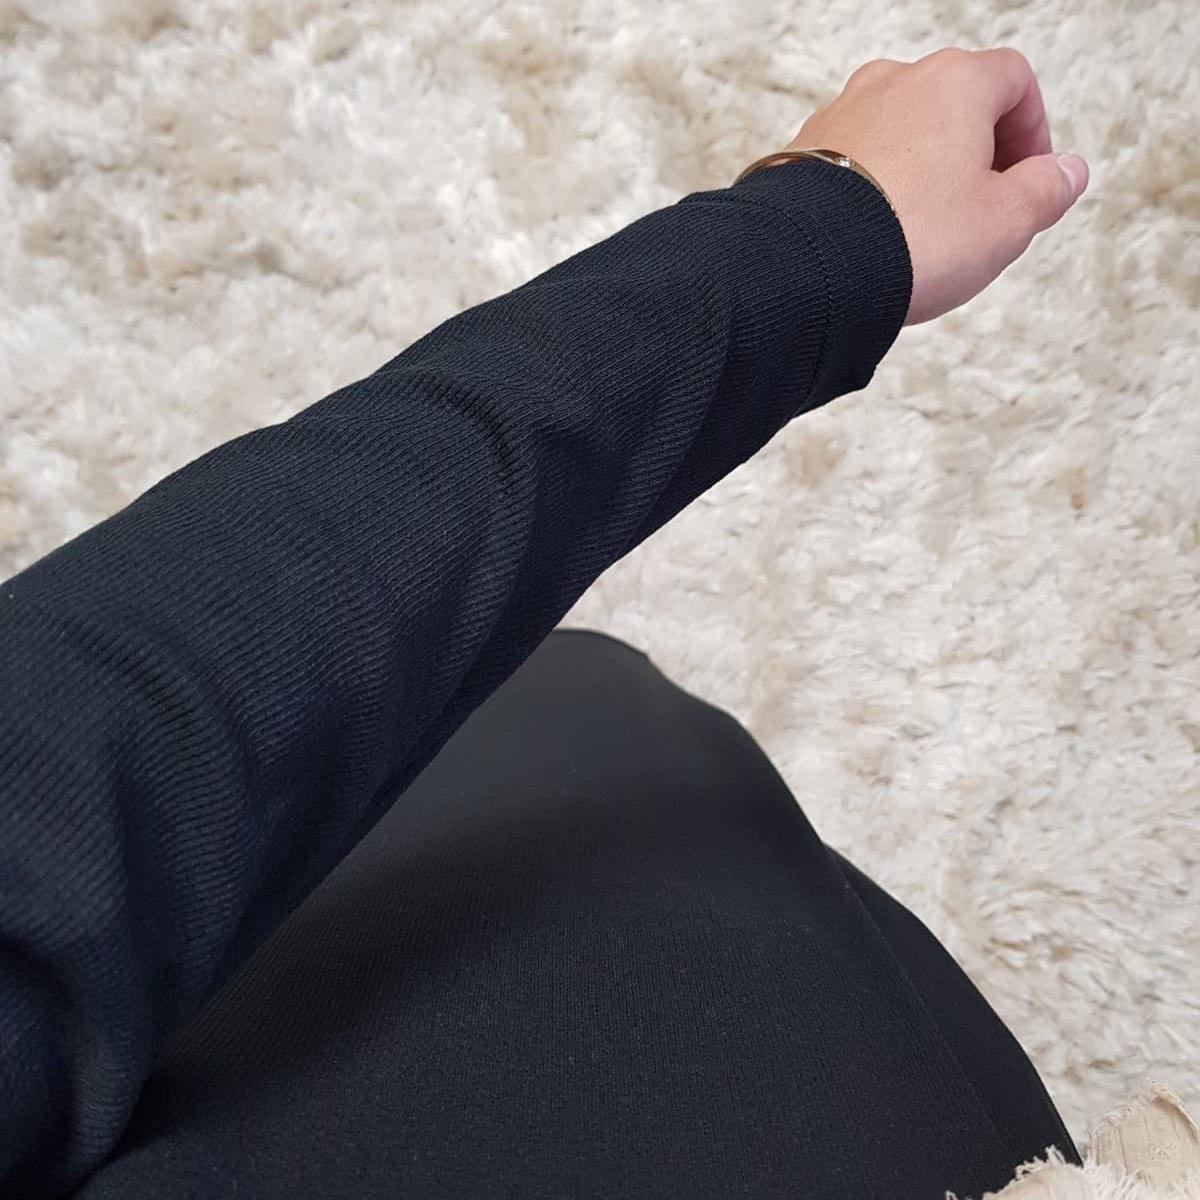 Body jurk acciaroli II zwart